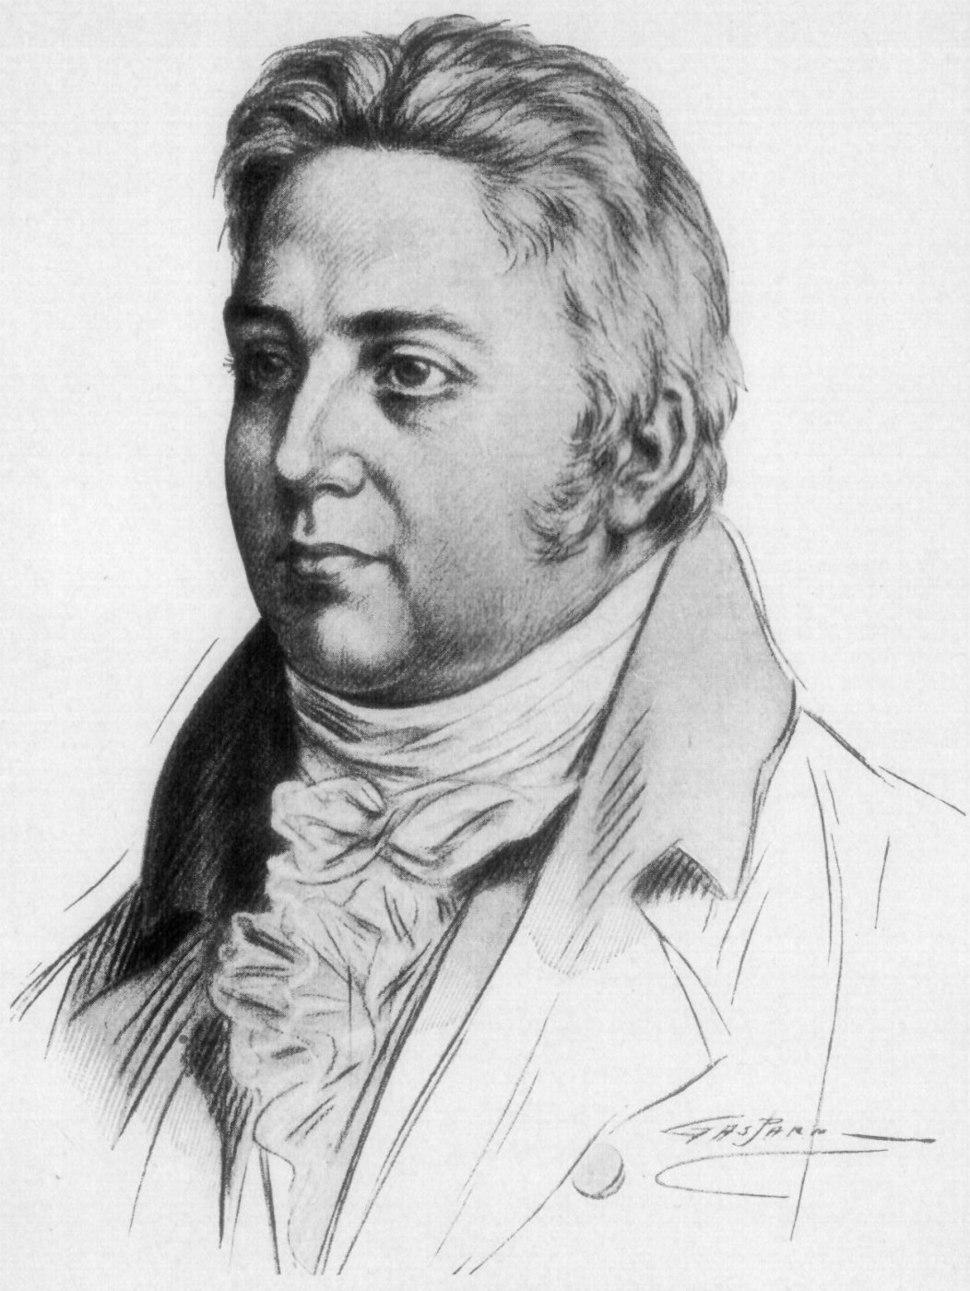 Gravure représentant Samuel Taylor Coleridge.